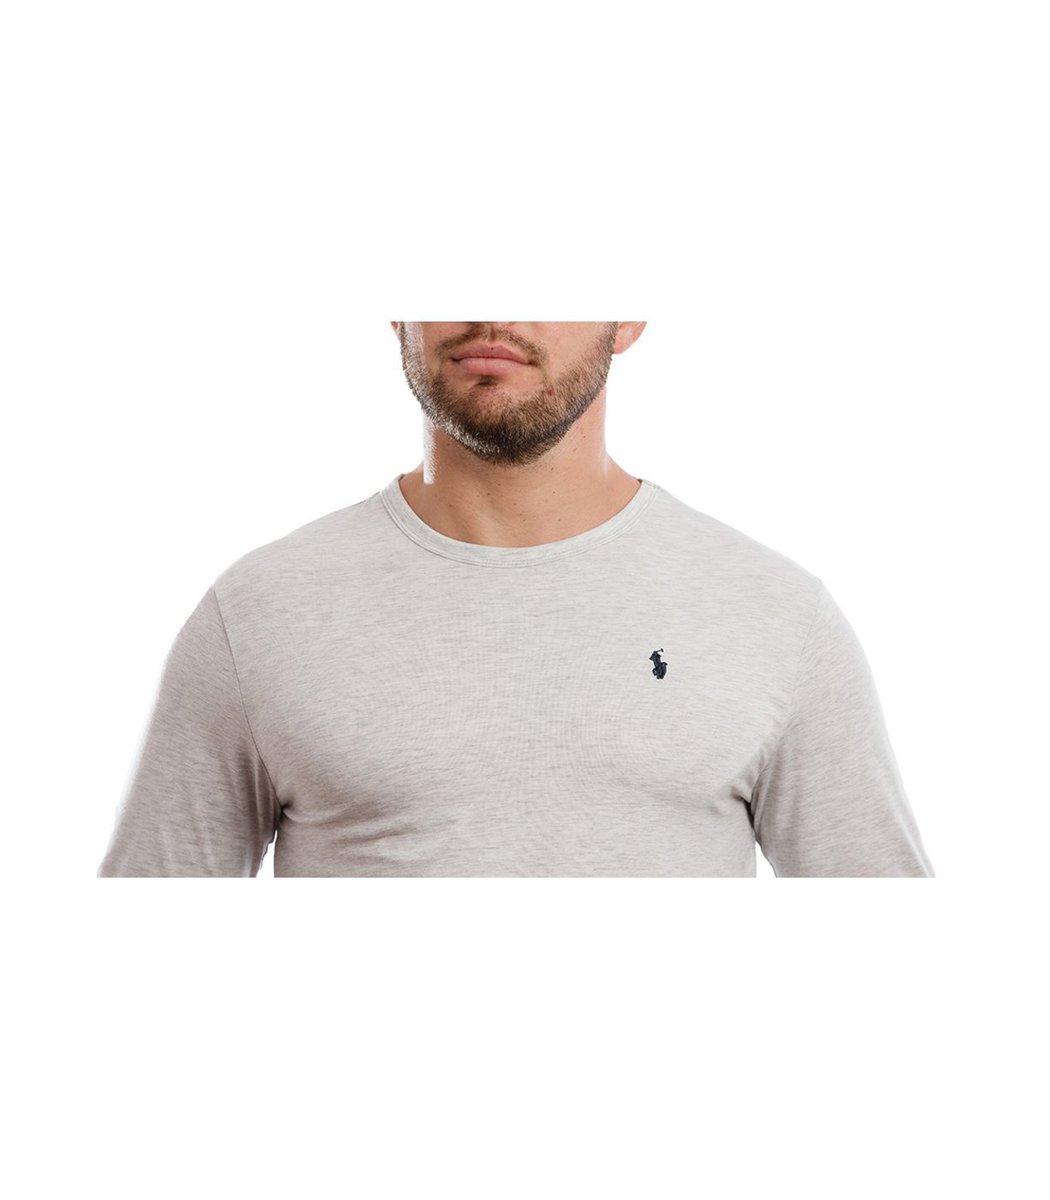 Лонгслив POLO Ralph Lauren LR1 (Серый) - Серый - Вид 5